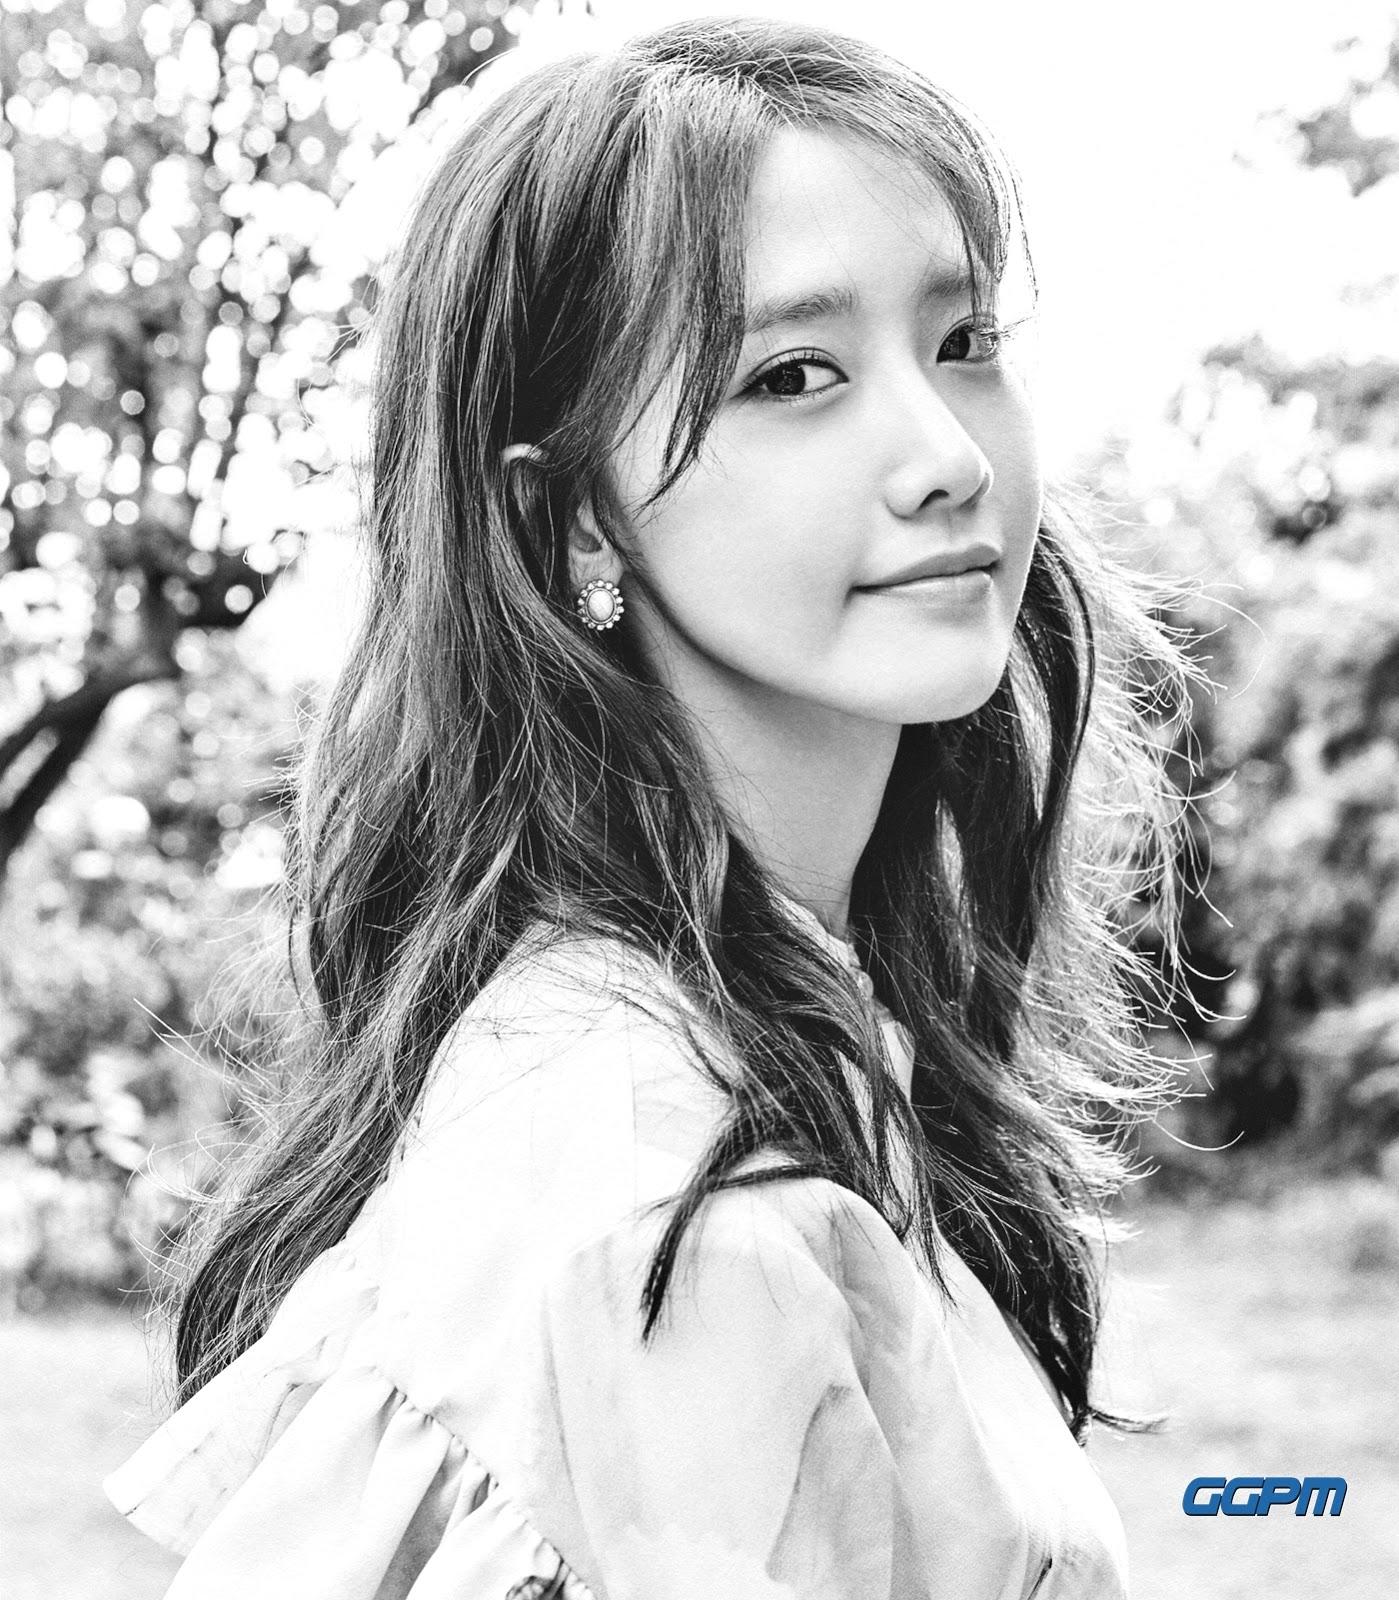 Yoona 「2017 SEASON'S GREETINGS」 Ordinary Days - Prologue (DESK ...